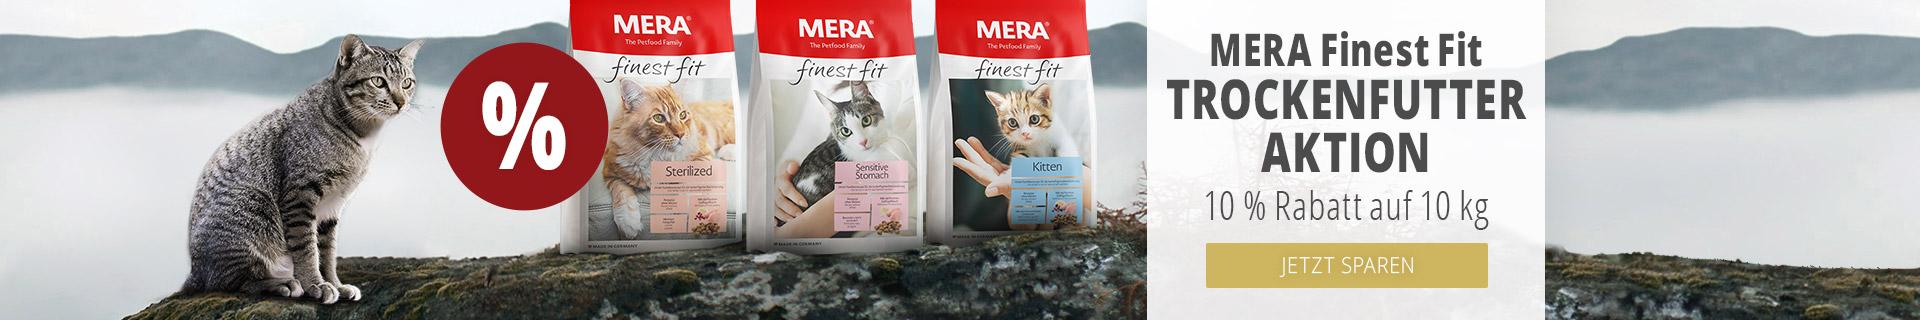 Mera Finest Fit Trockenfutteraktion 10% Rabatt auf 10kg